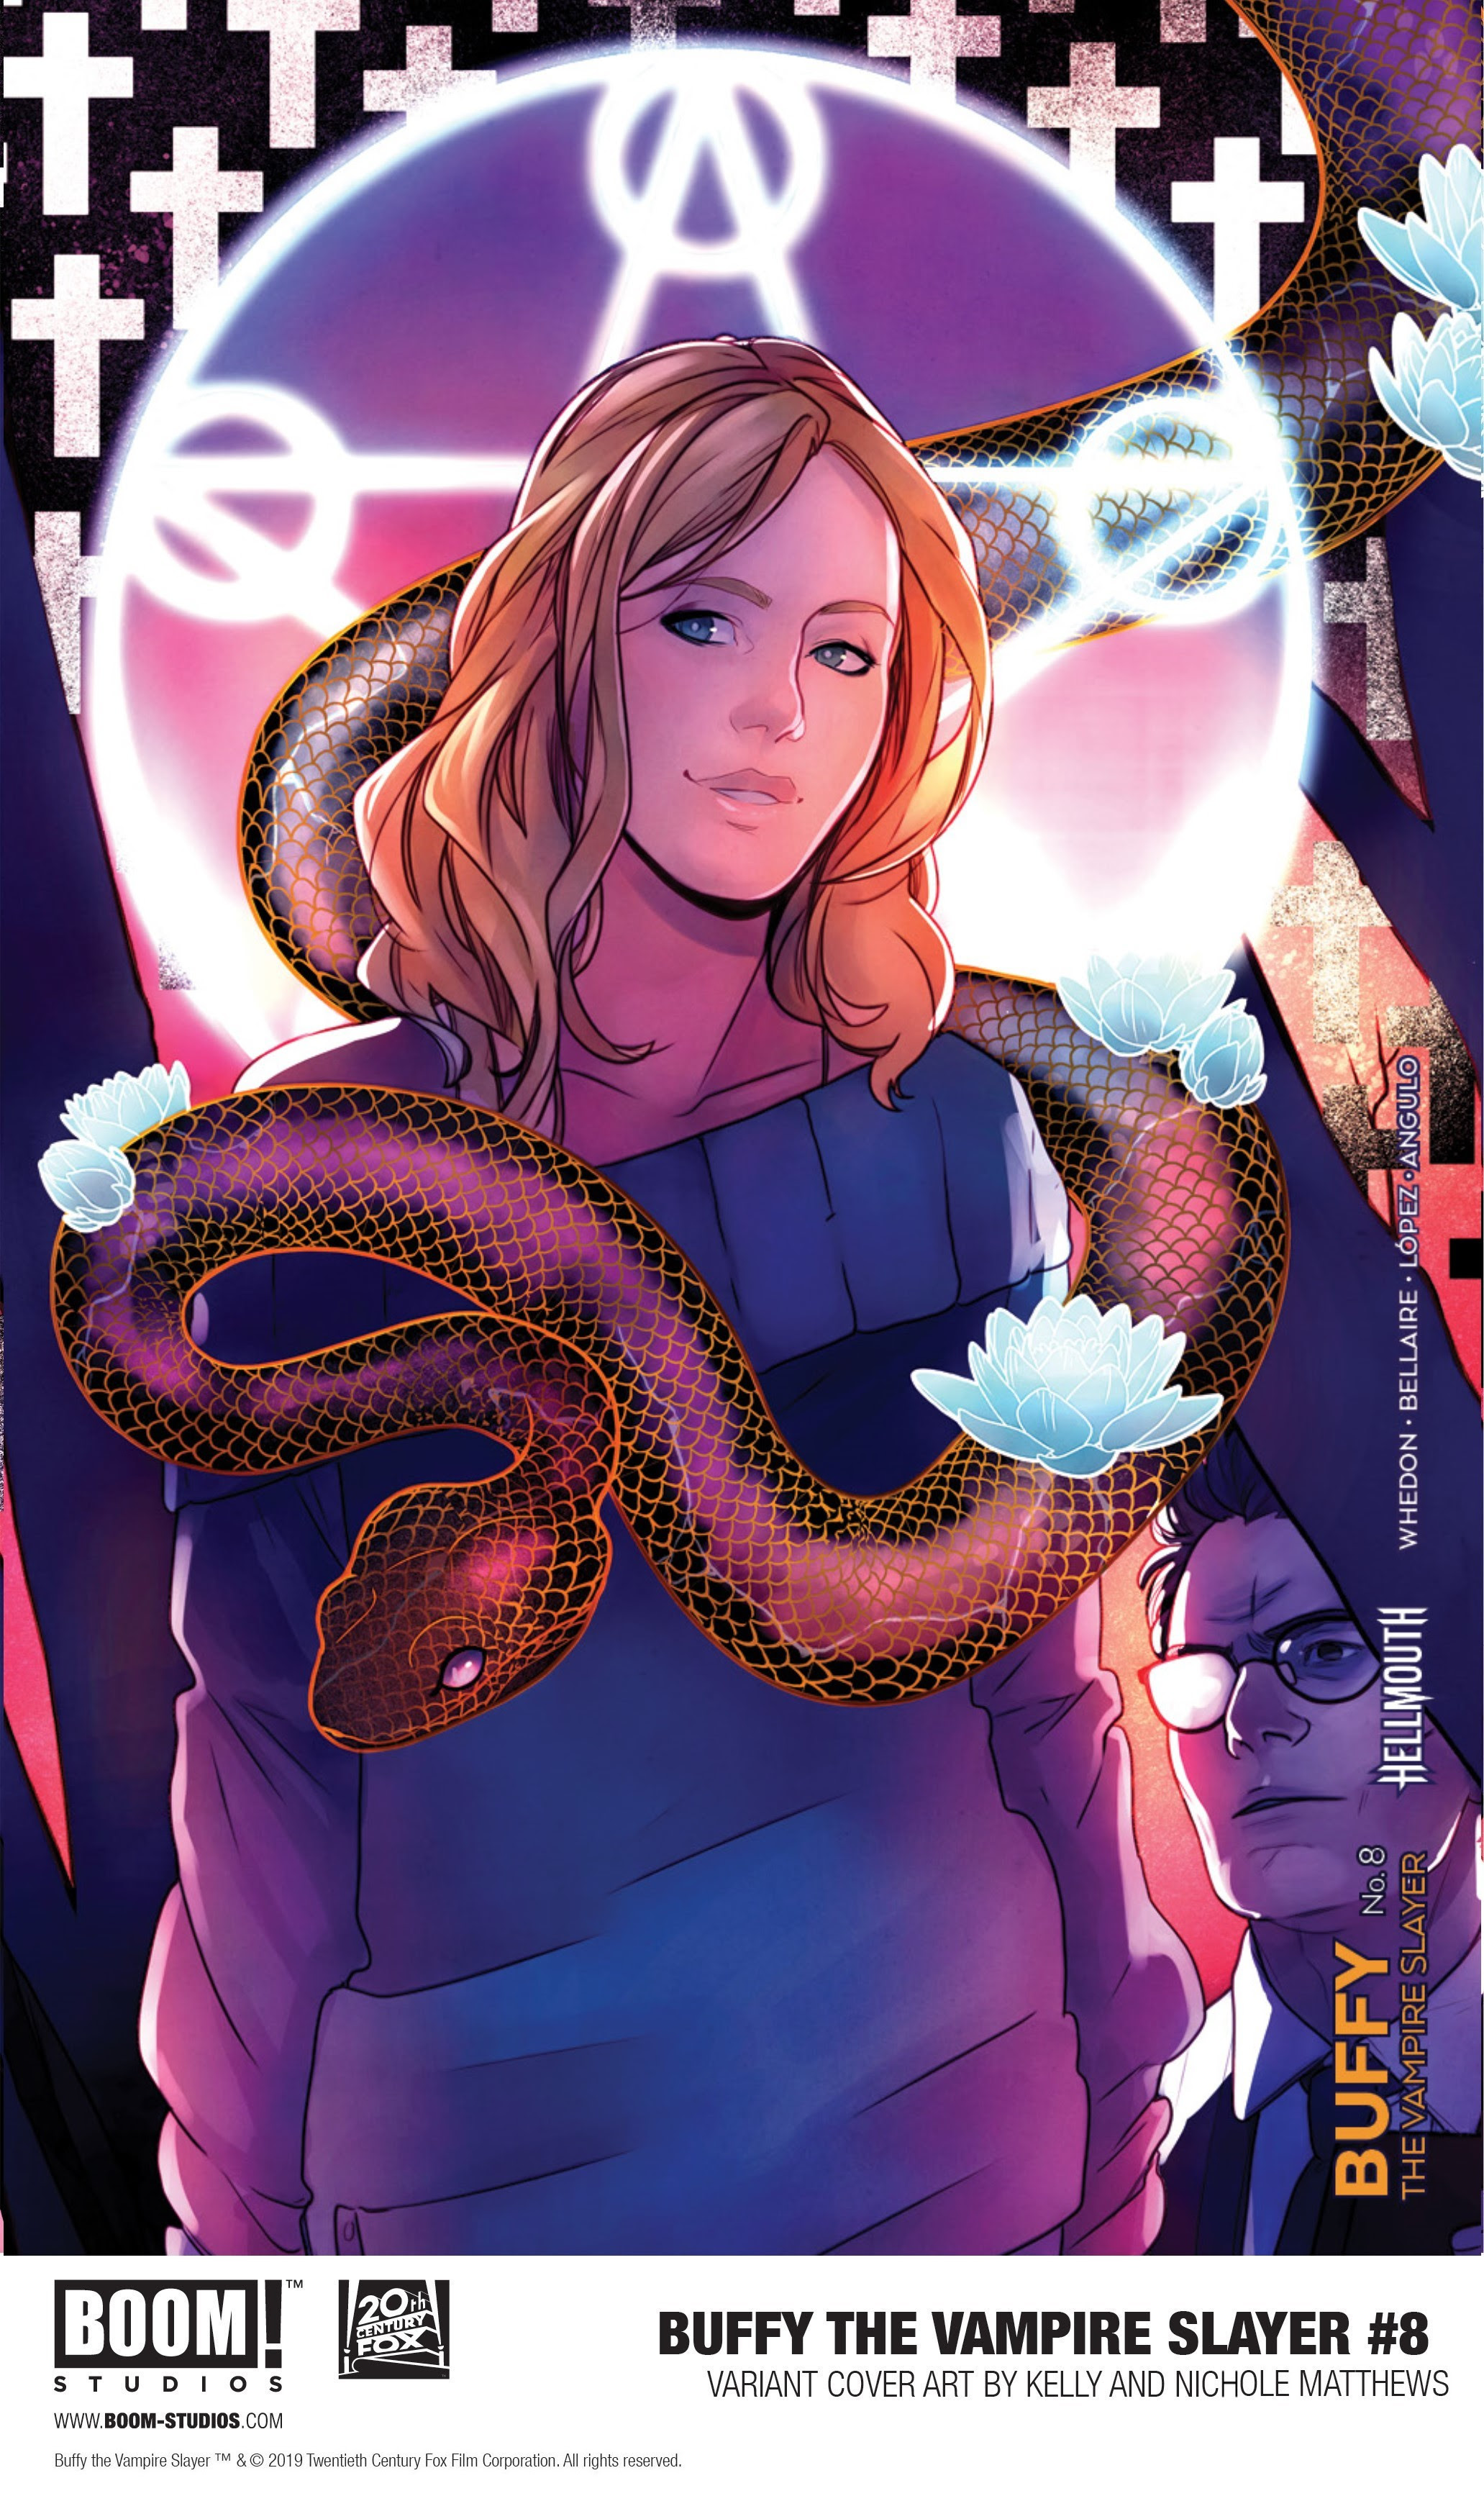 Buffy the Vampire Slayer #8